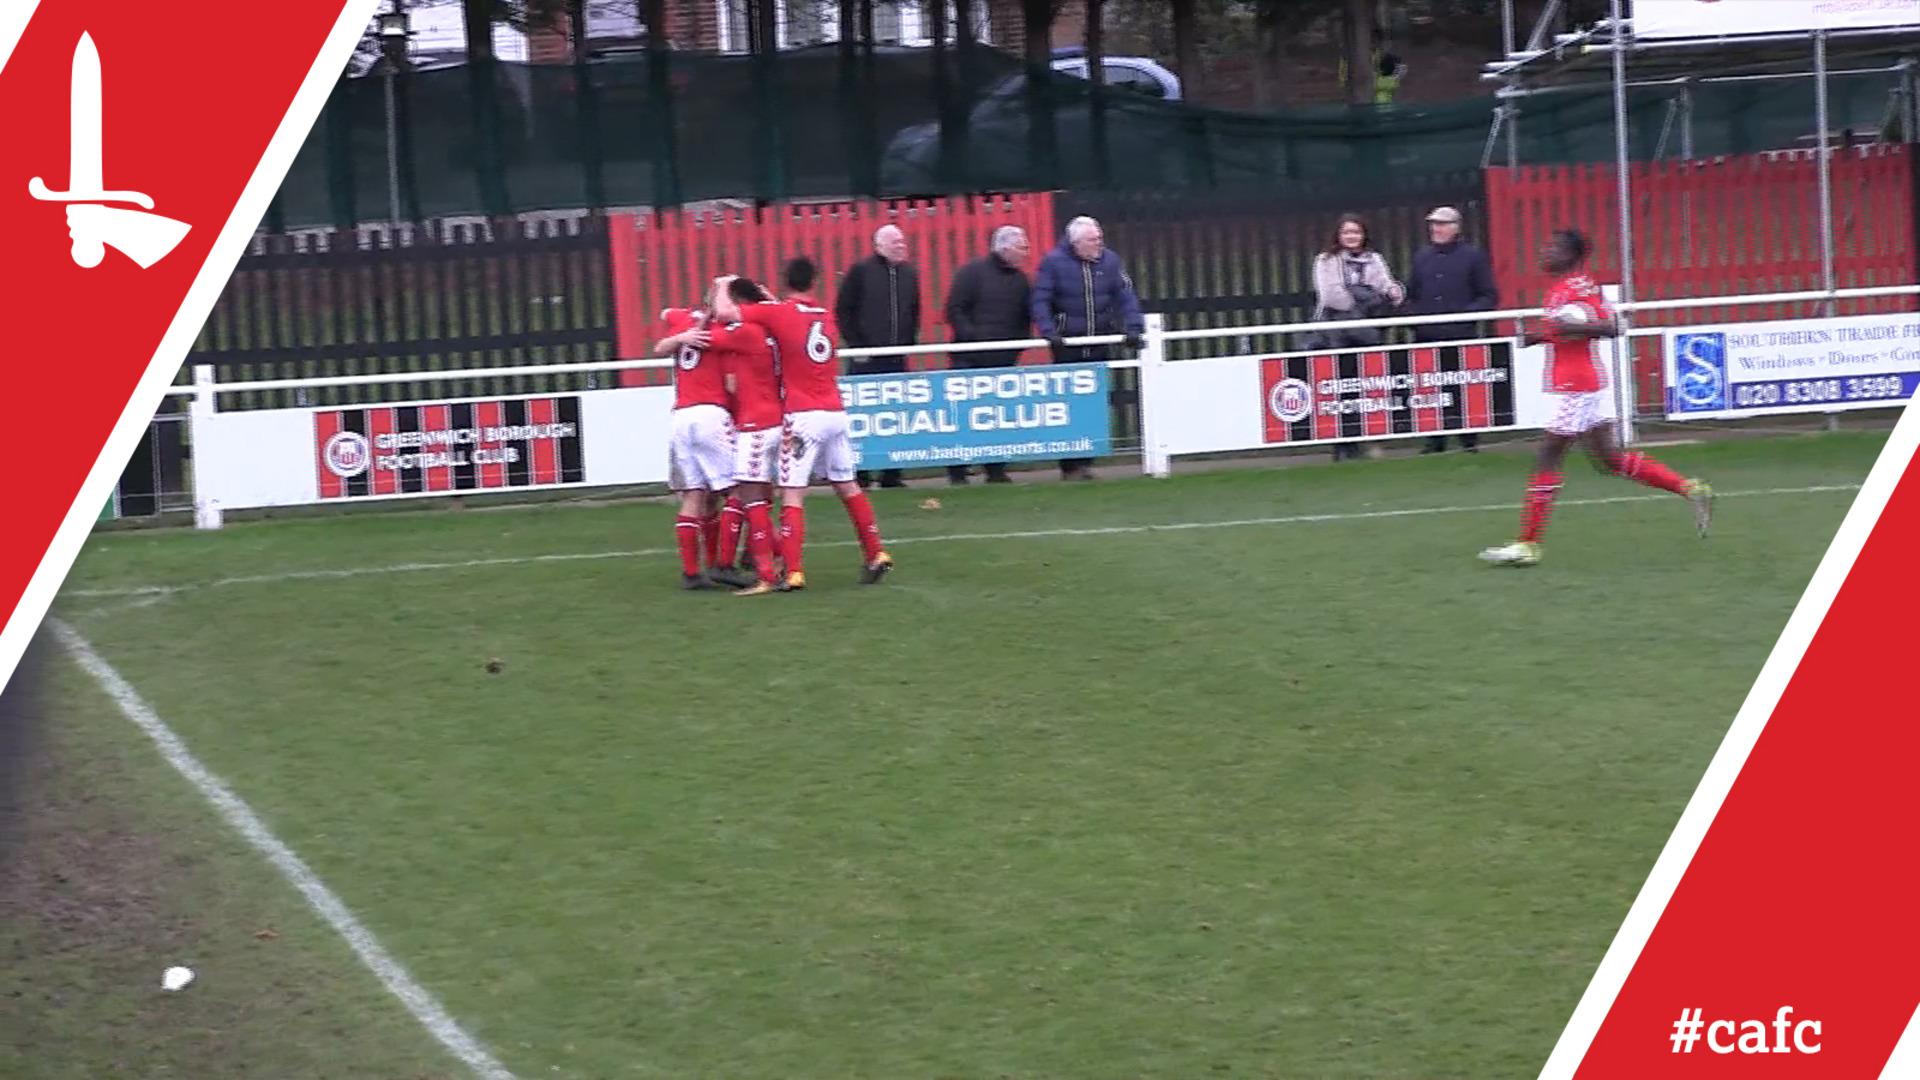 U23 HIGHLIGHTS | Charlton 1 Ipswich 1